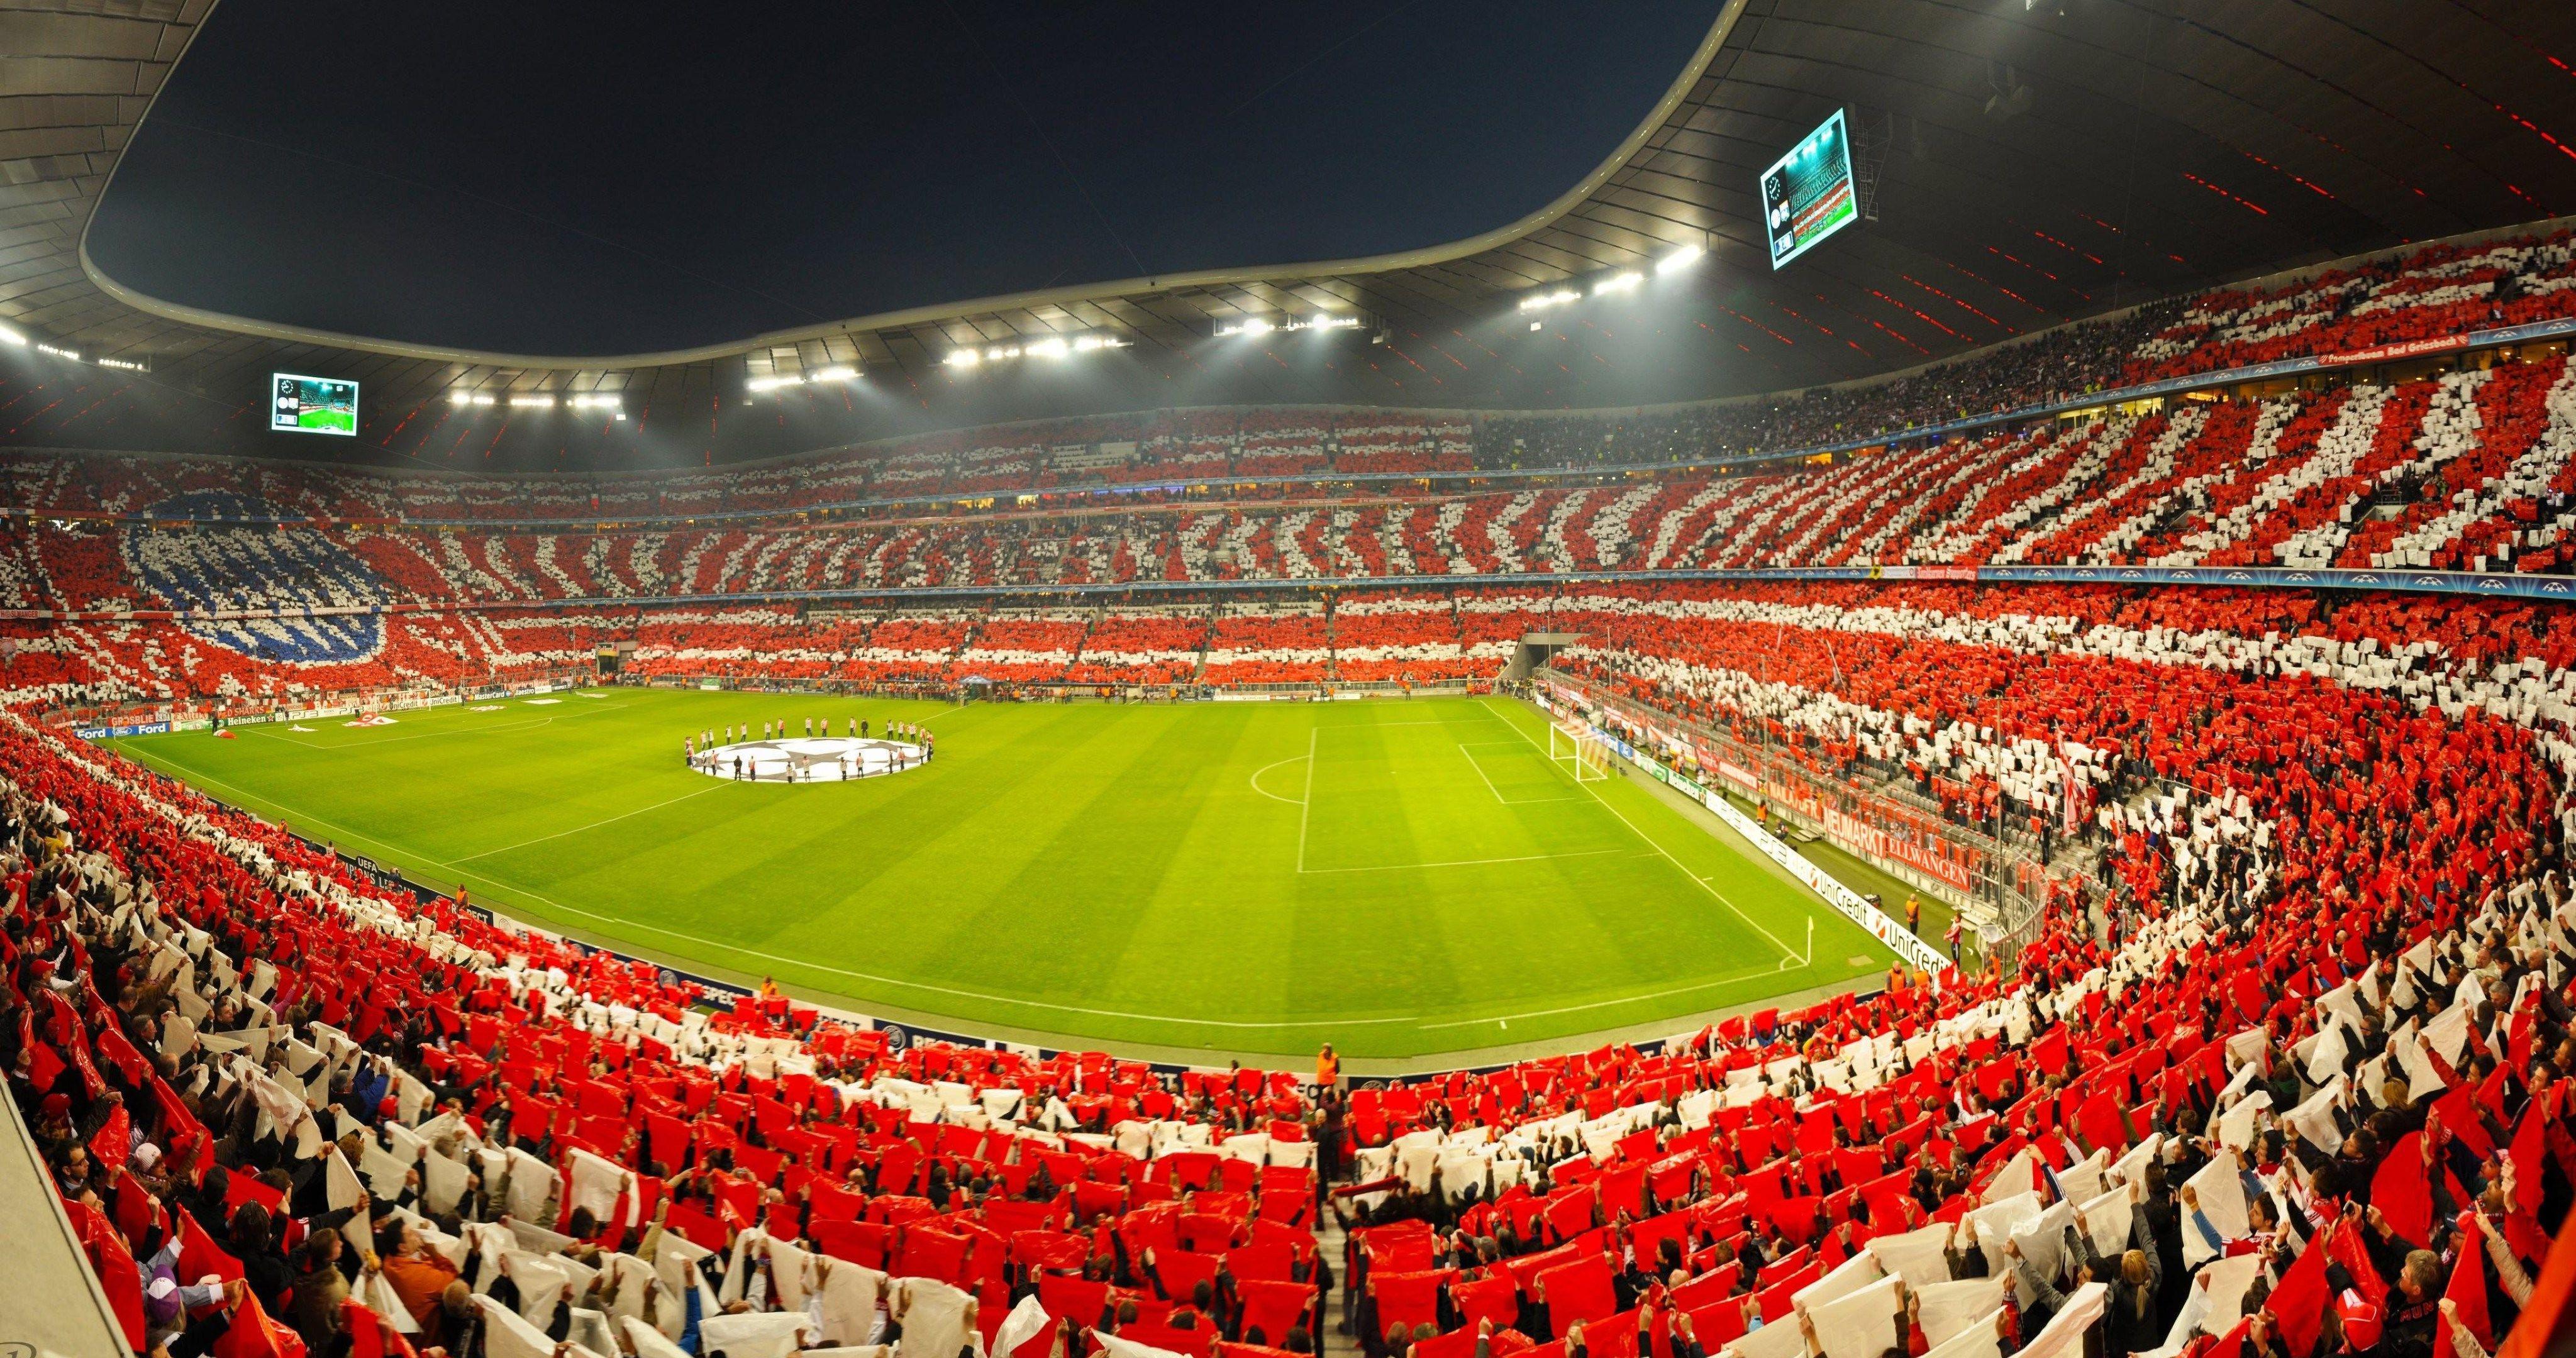 4k Ultra Hd Soccer Wallpapers Top Free 4k Ultra Hd Soccer Backgrounds Wallpaperaccess